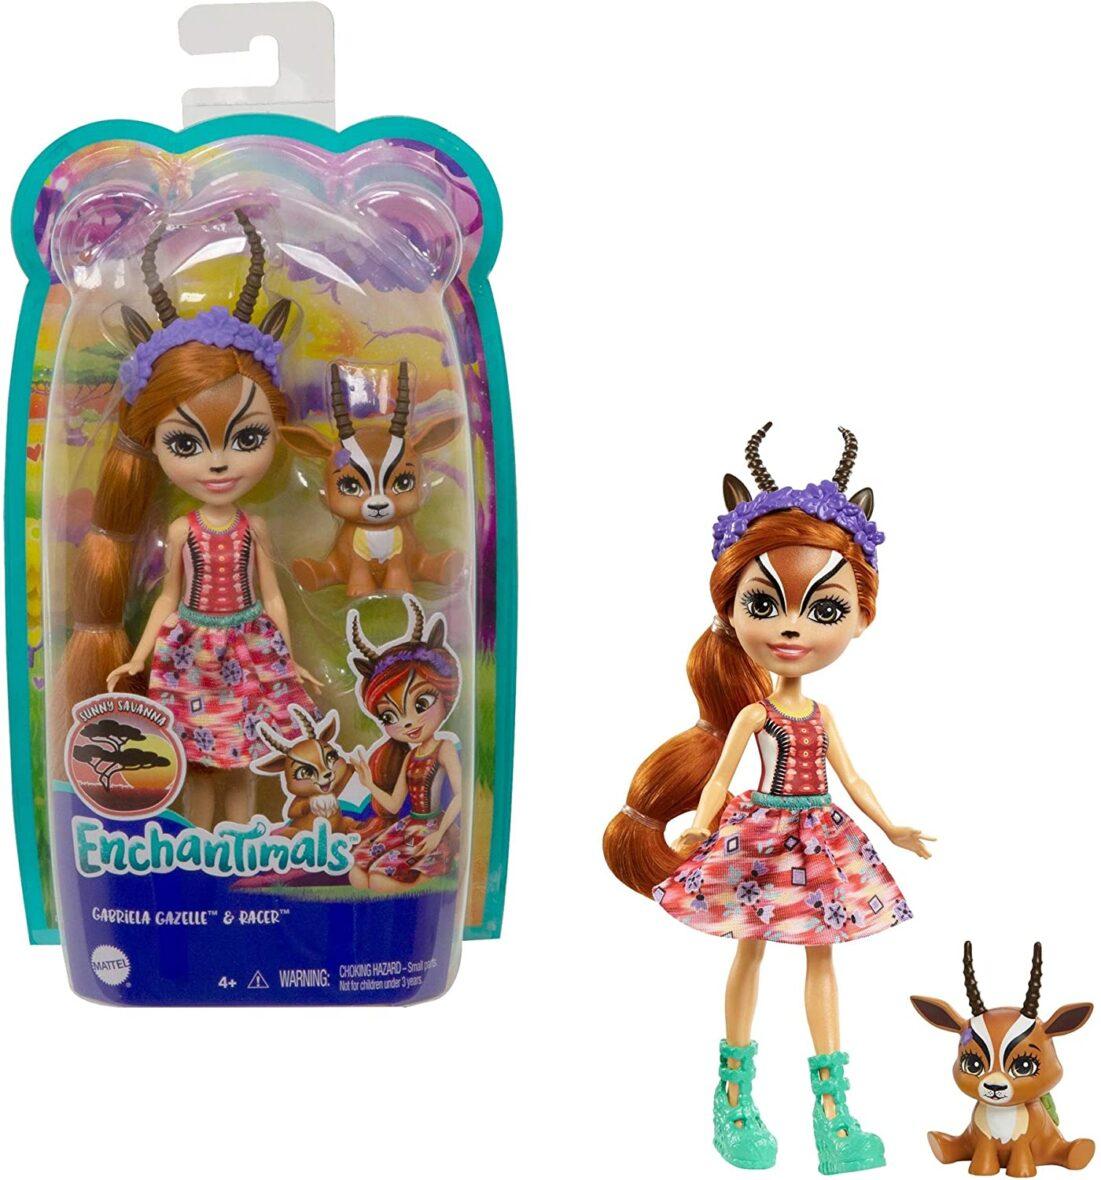 Enchantimals Papusi Si Animalute Gabriela Gazelle & Racer